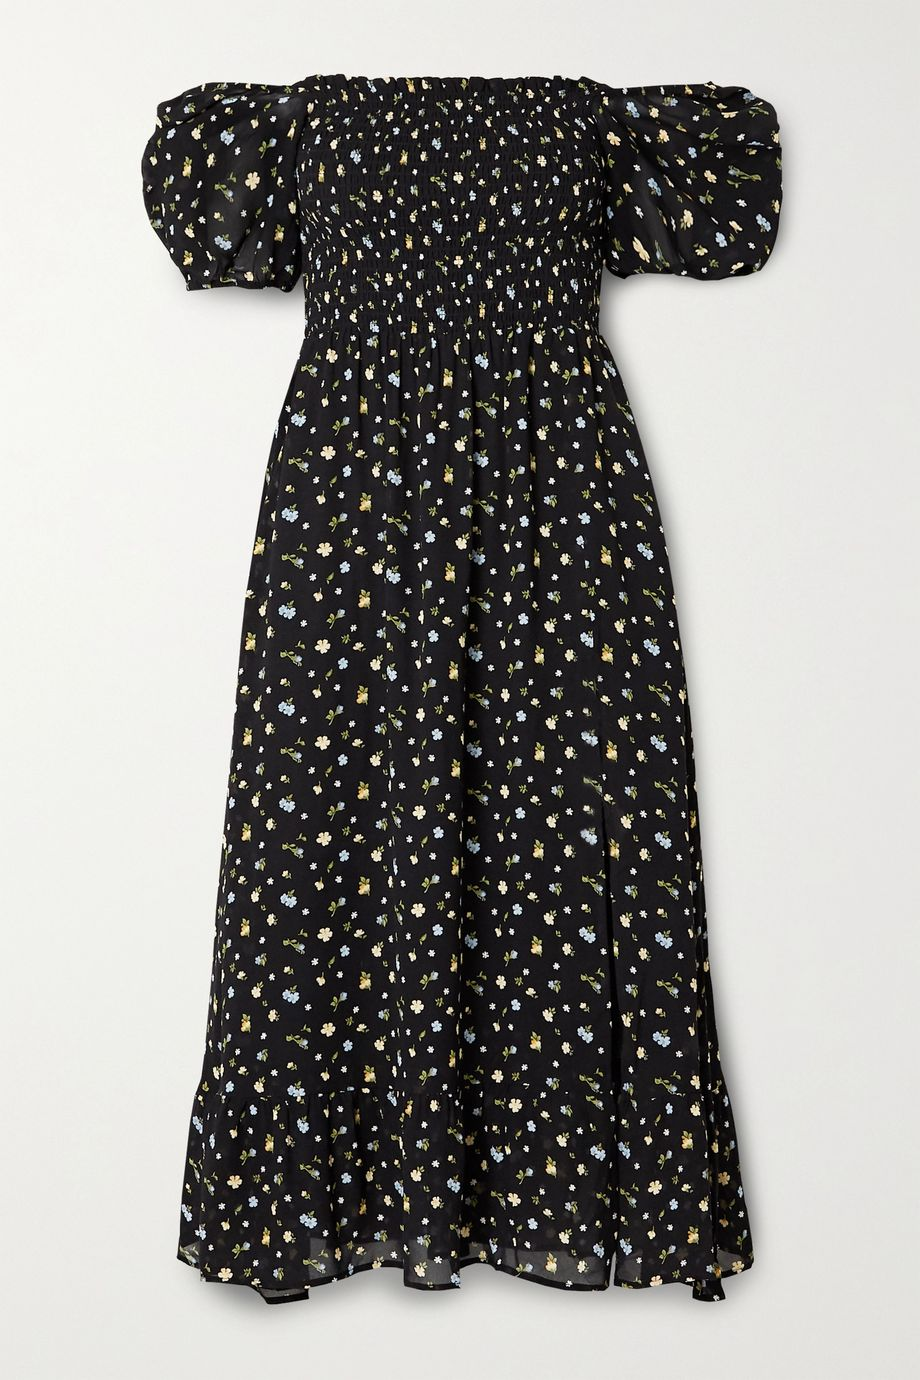 Reformation Meadow smocked floral-print georgette midi dress